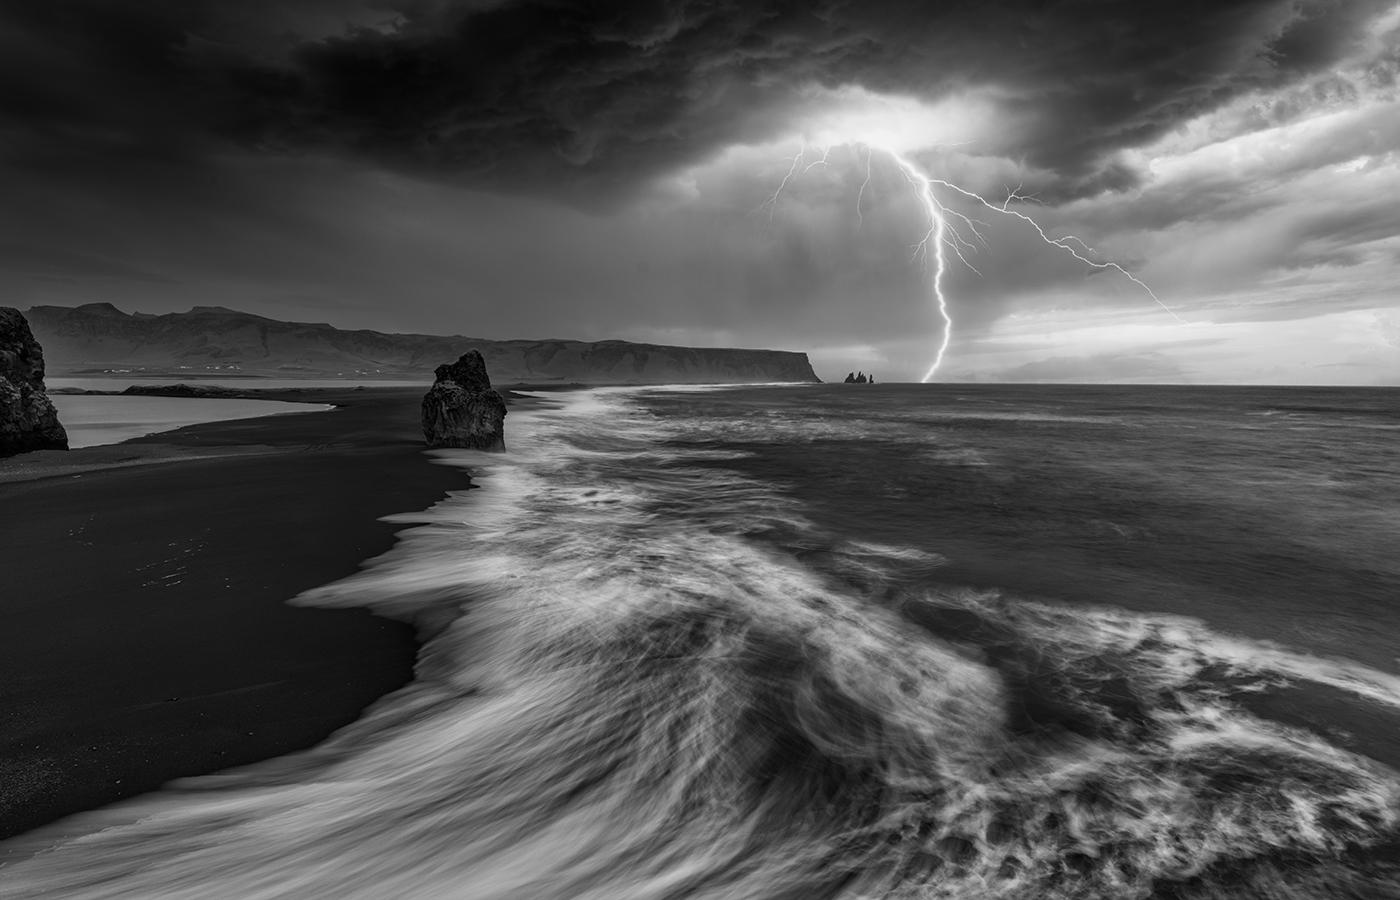 Storm on the Horizon small